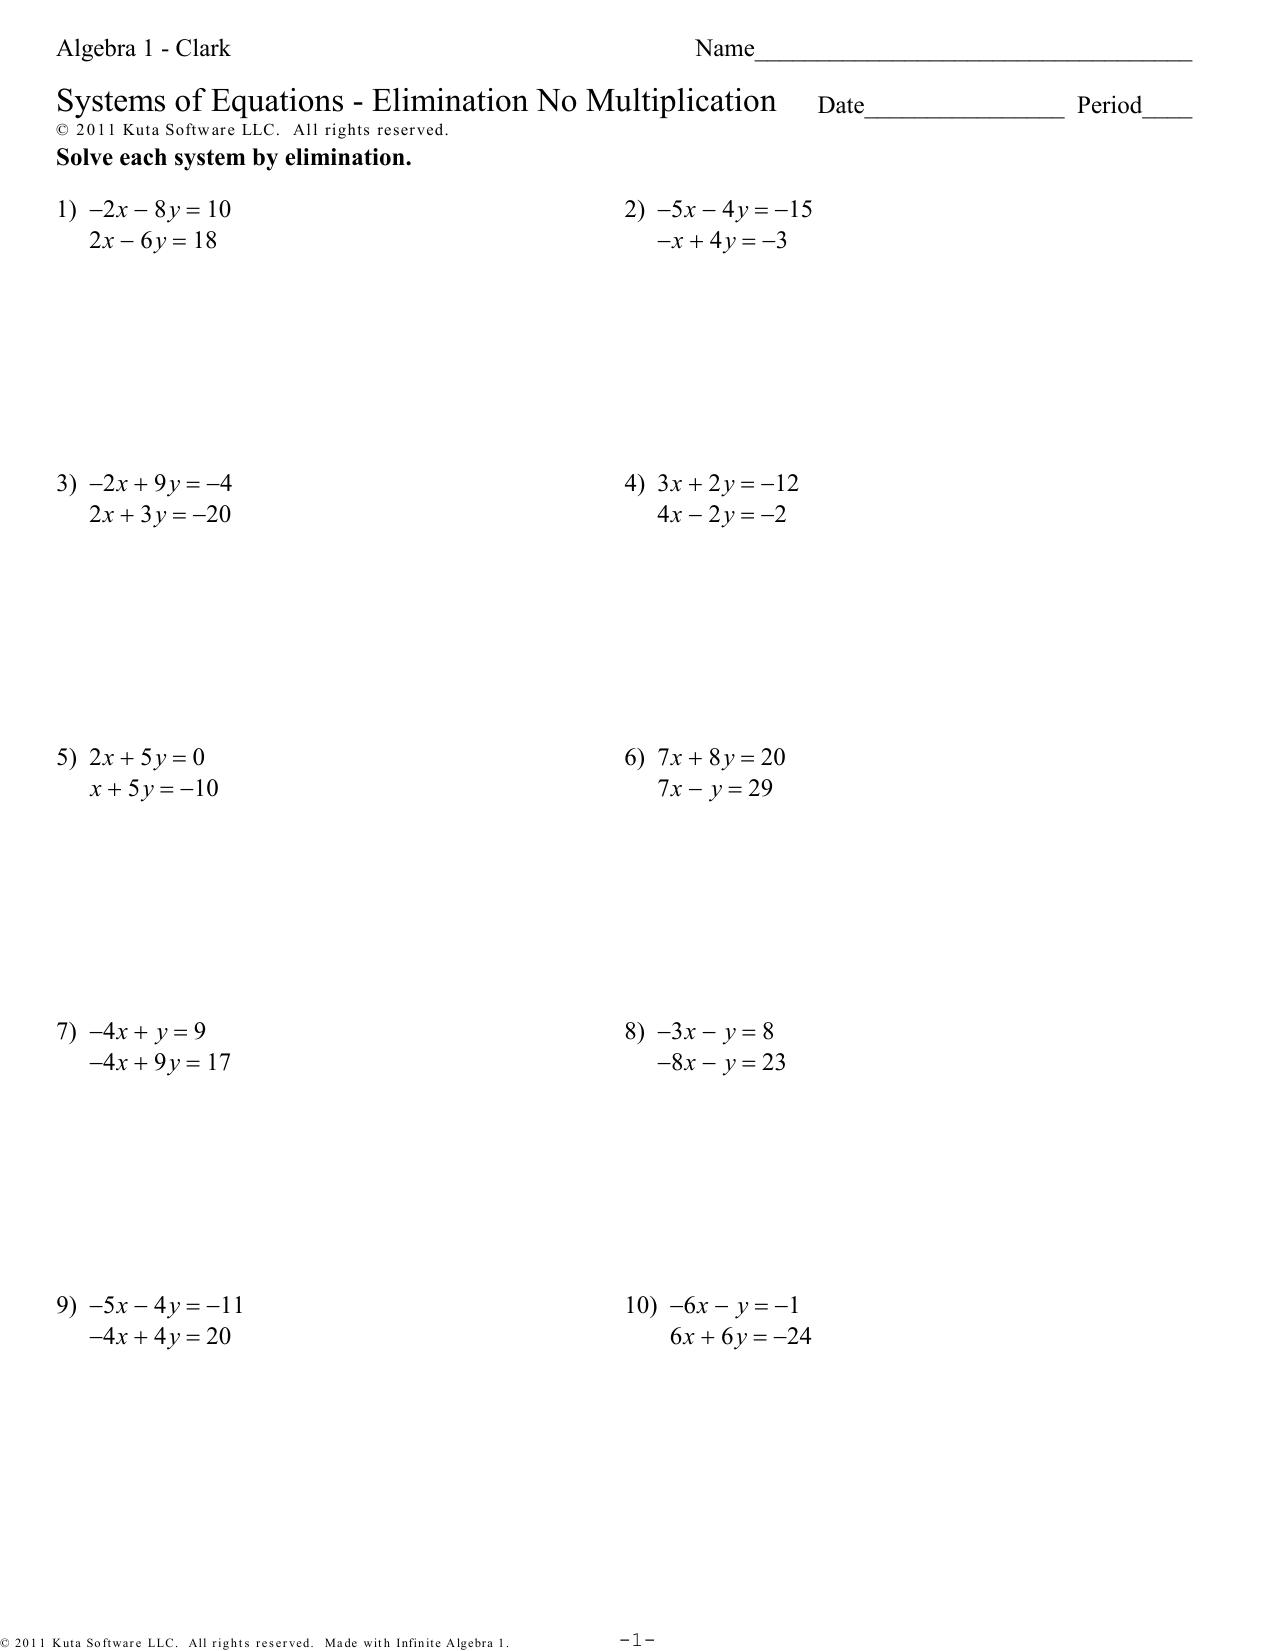 Algebra 1 Elimination Using Multiplication Worksheet